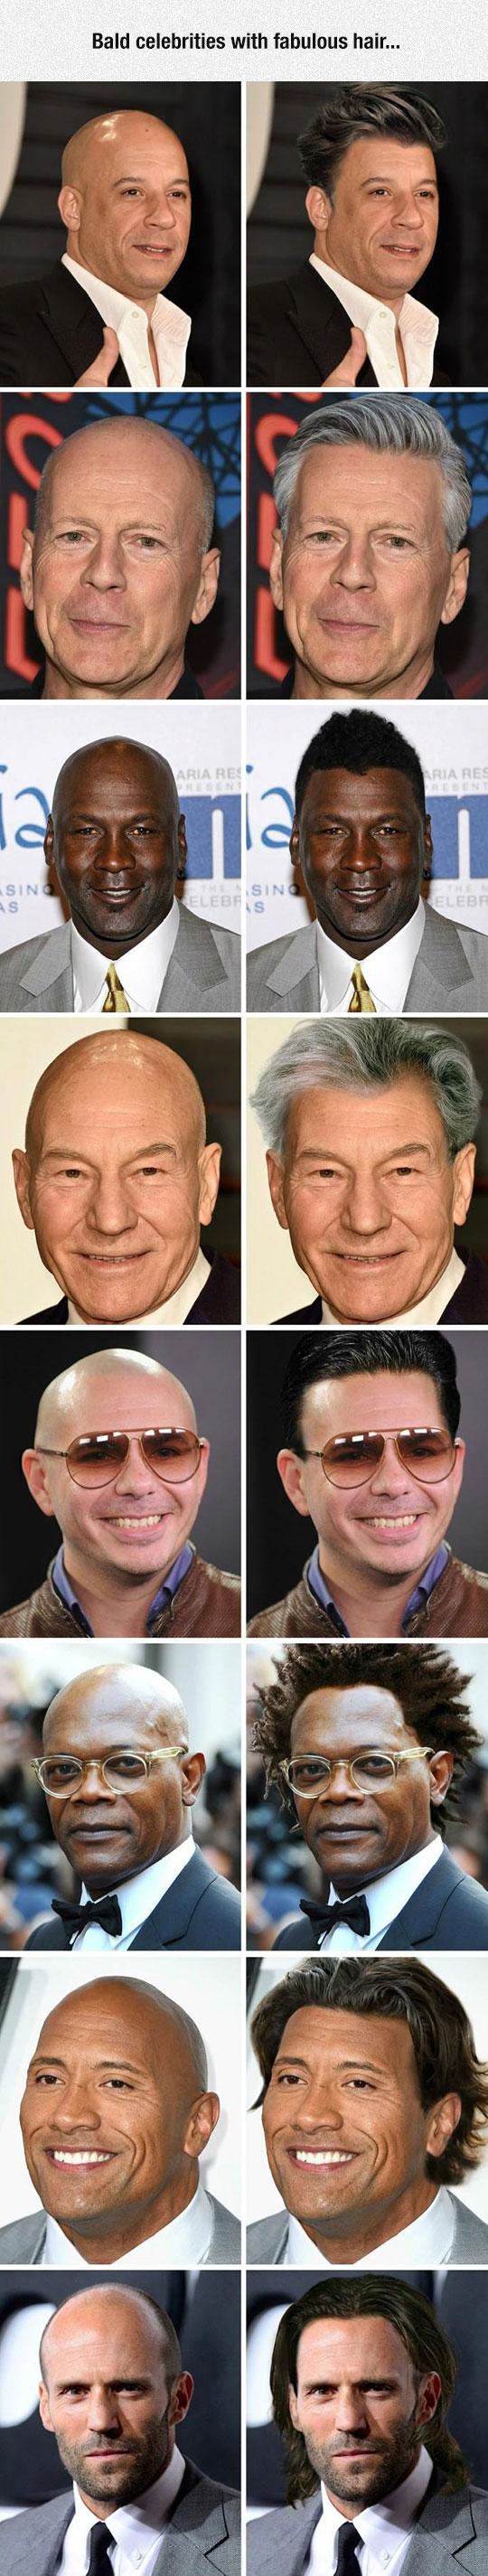 If Bald Celebrities Had Hair